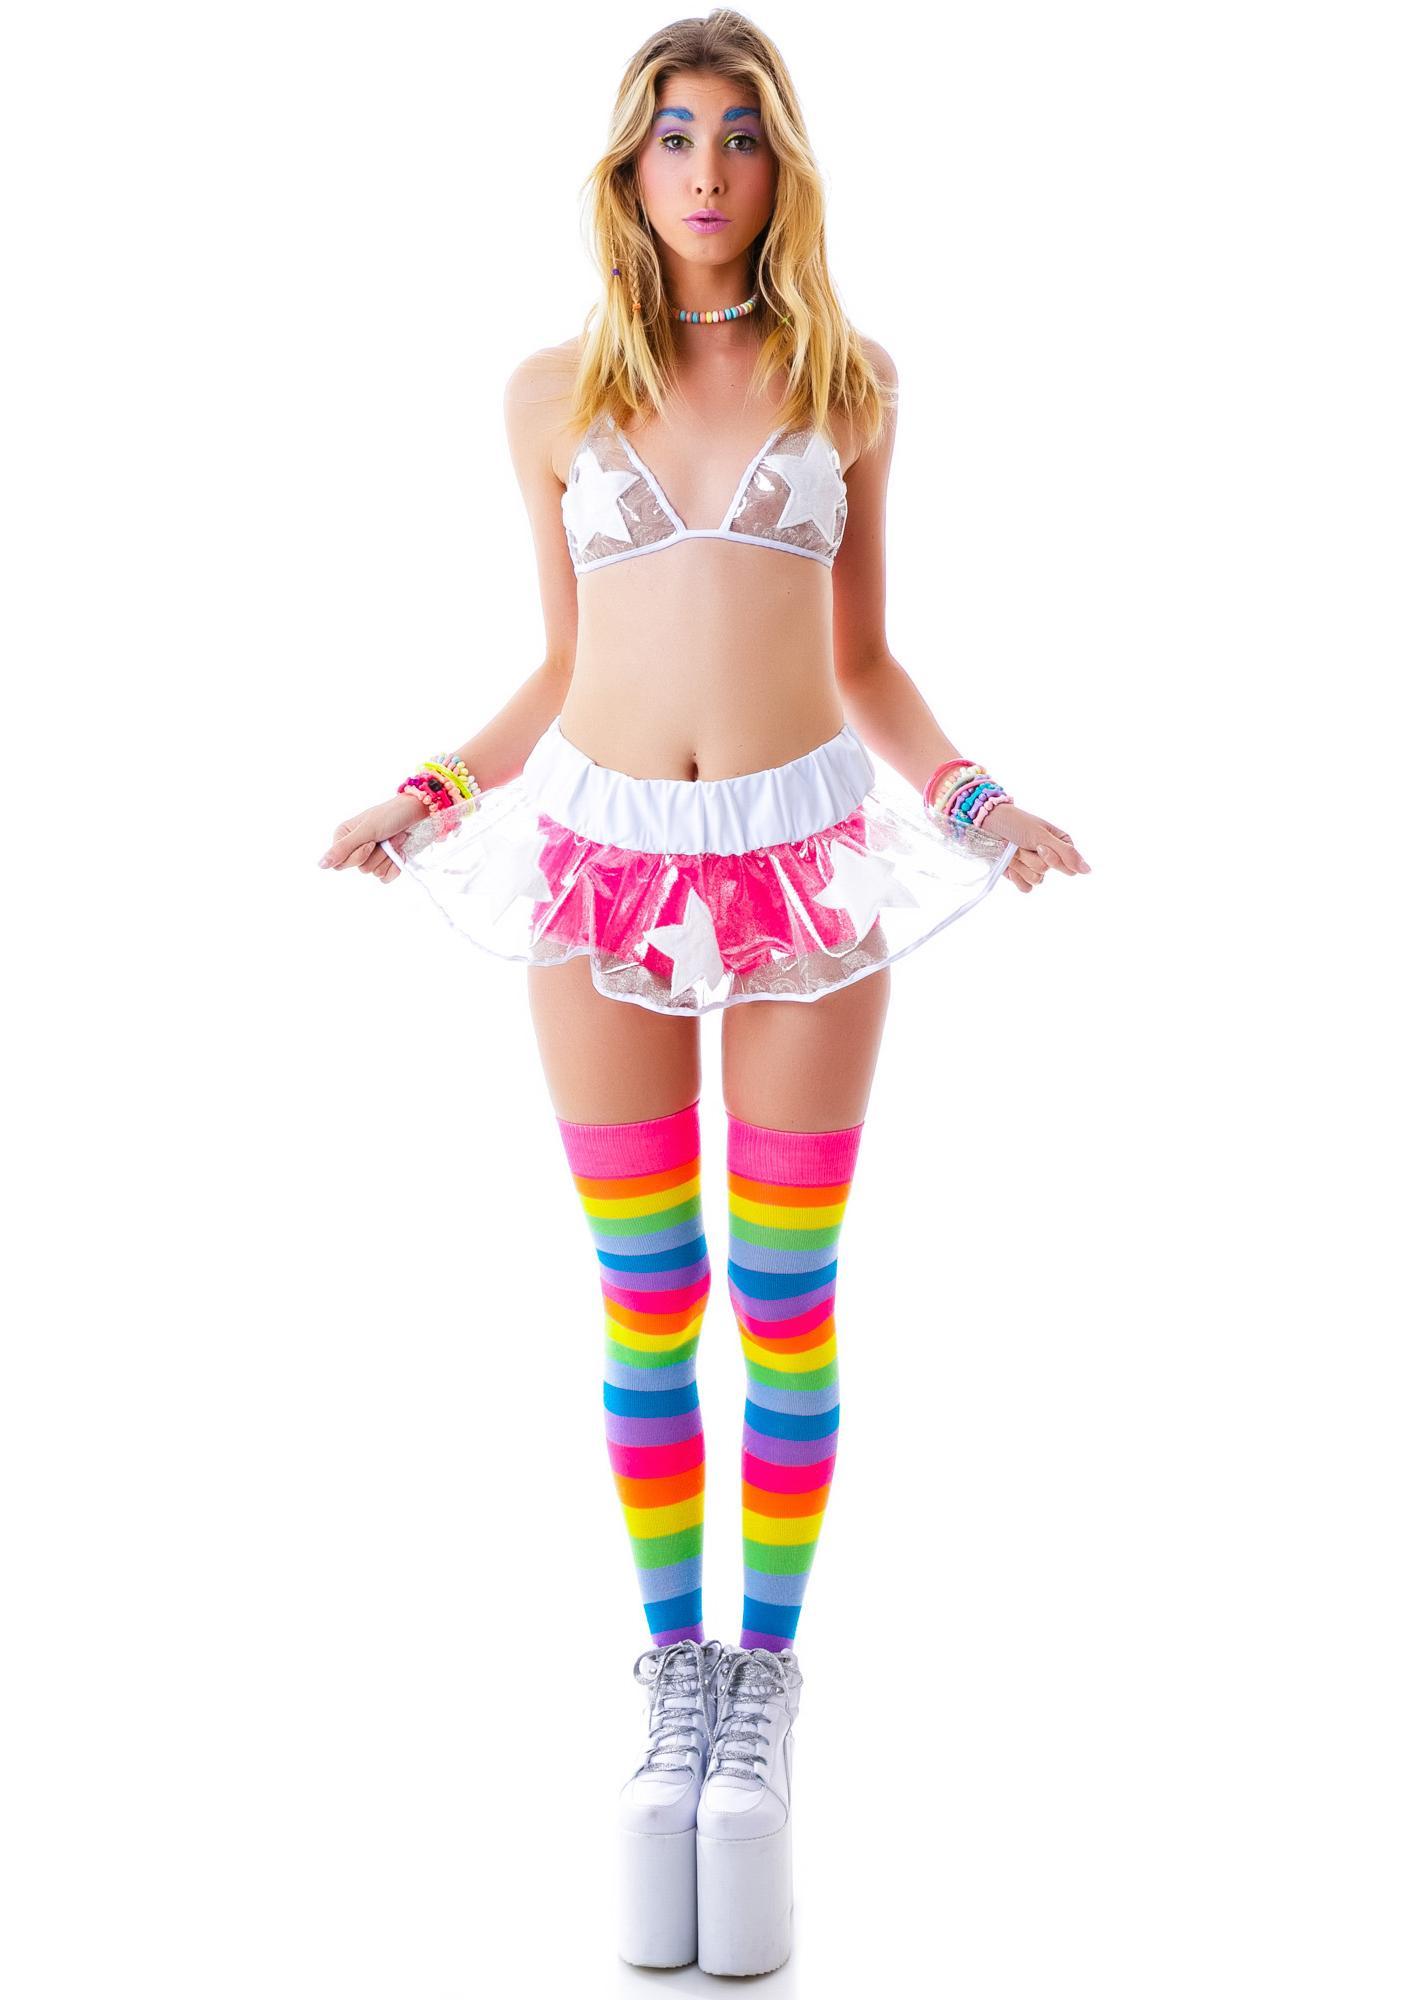 J Valentine Wish Upon A Star Skirt Set